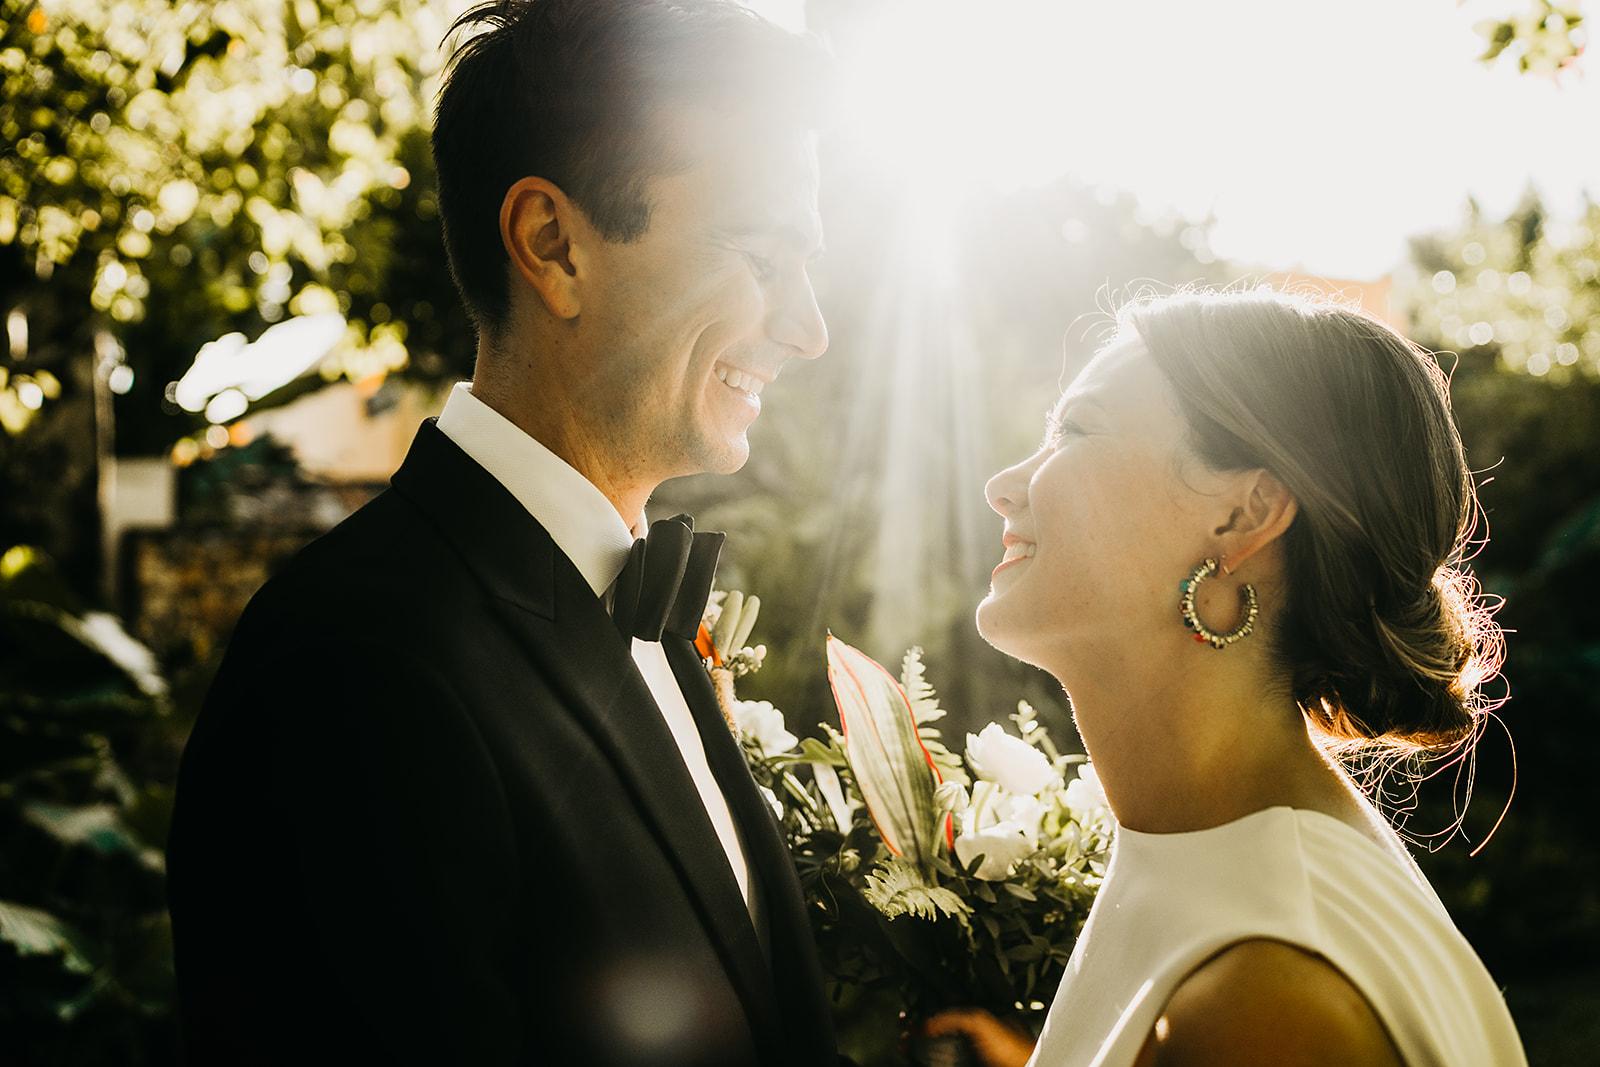 AmandaMarkus-Hacienda-Sac-Chich-Merida-Wedding-308_websize.jpg